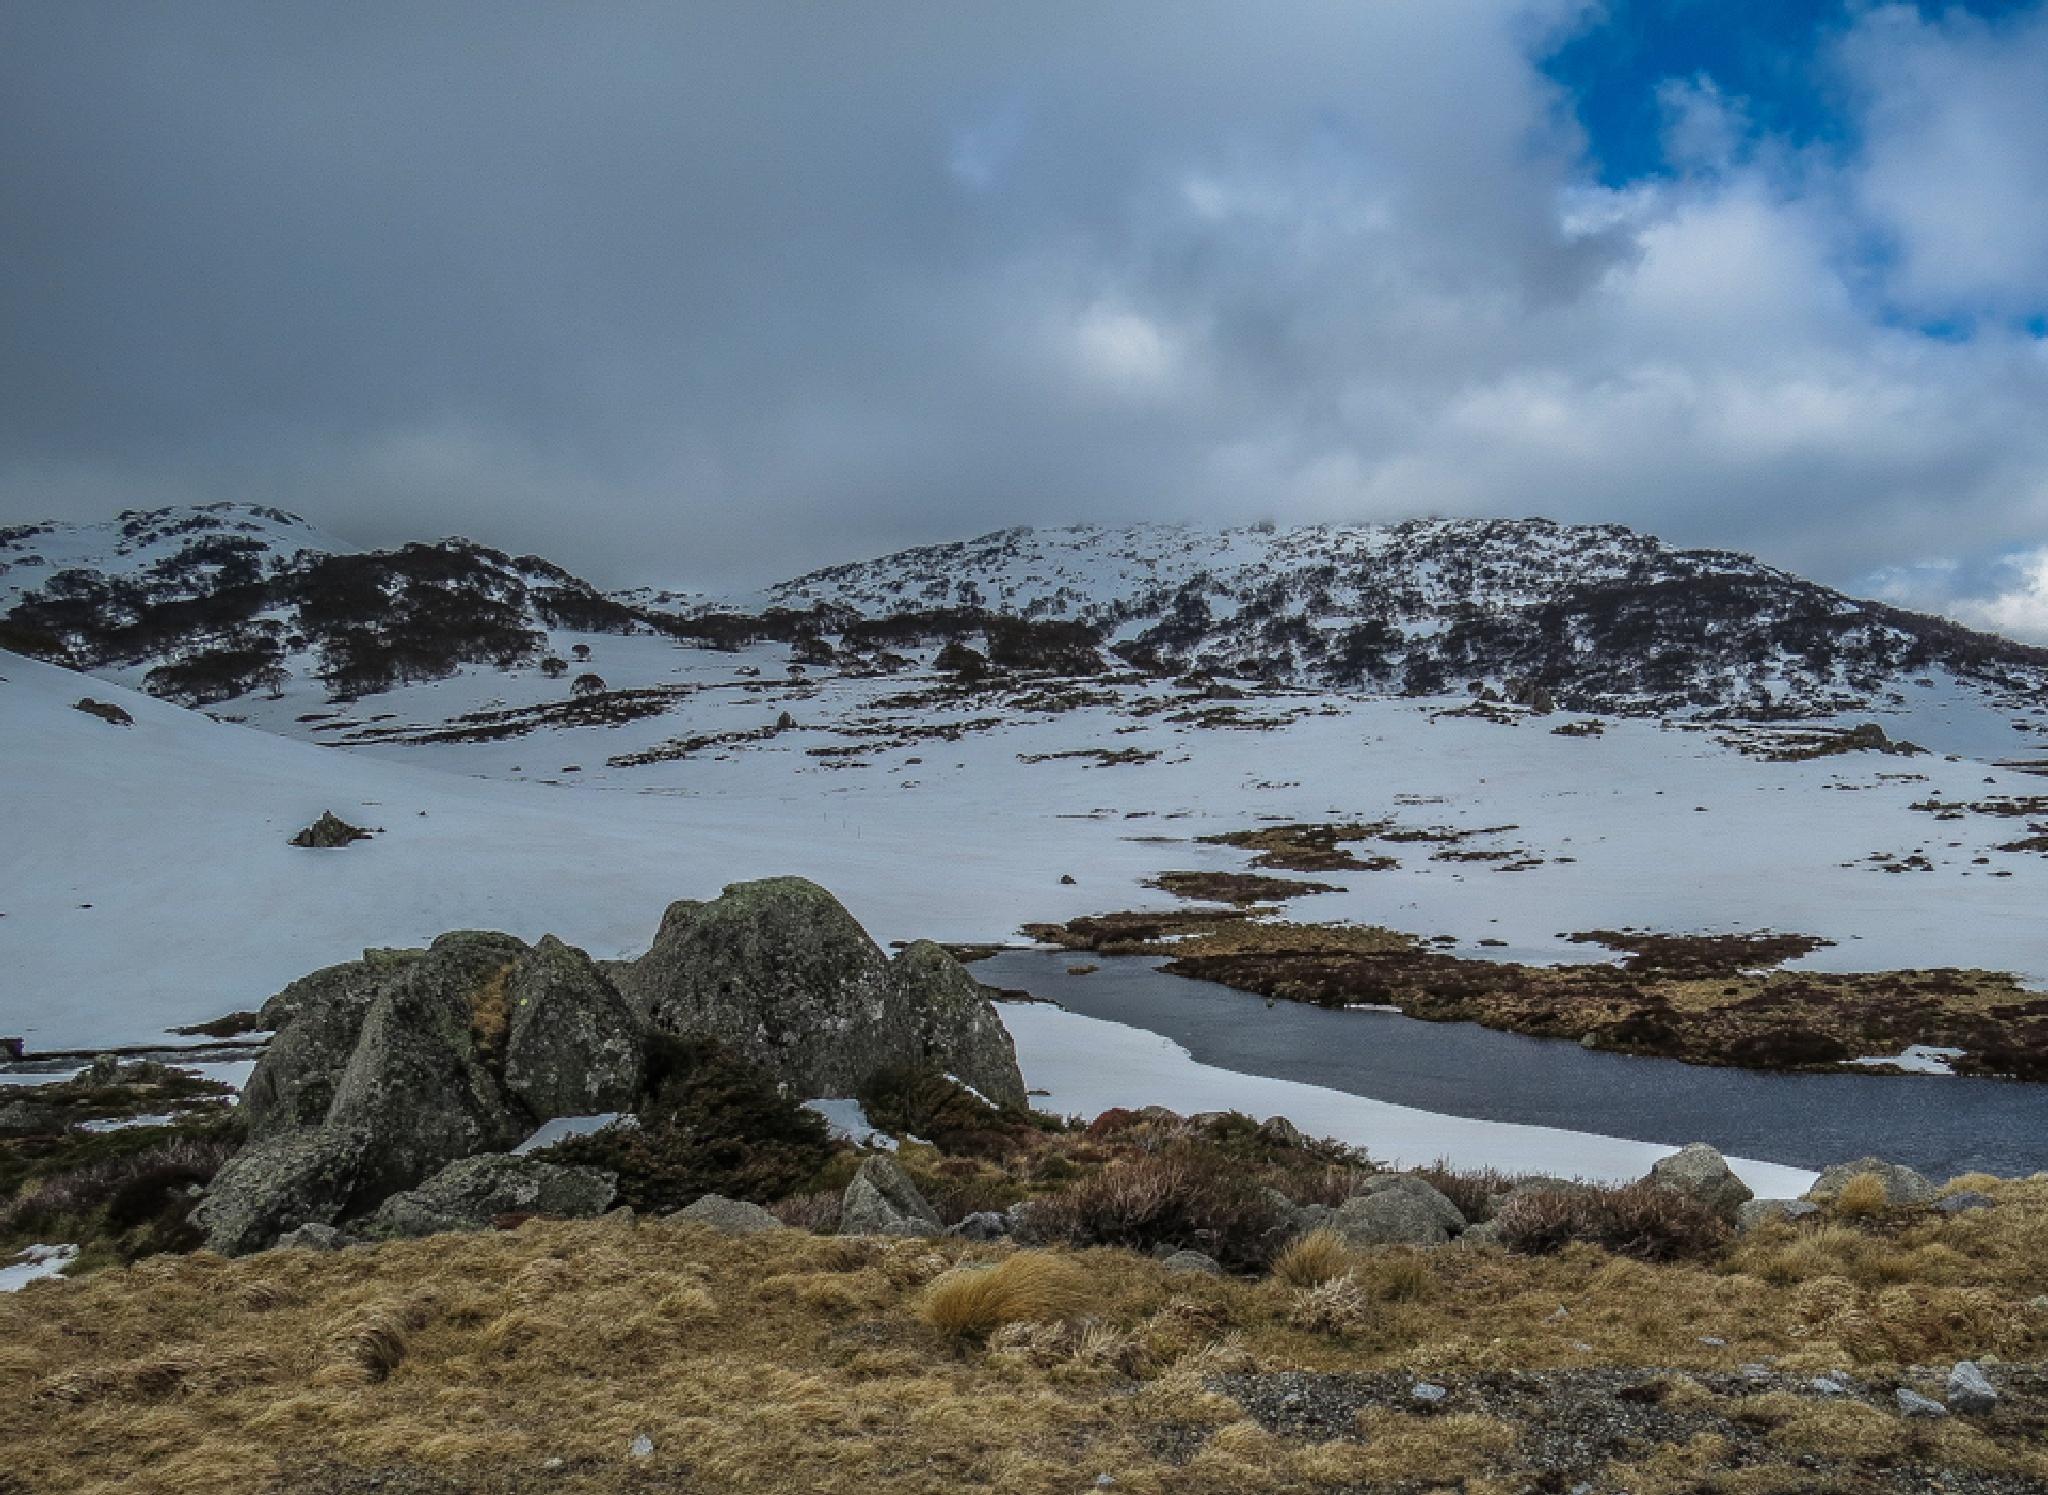 Snow melts & creeks flow again  by Jan Taylor